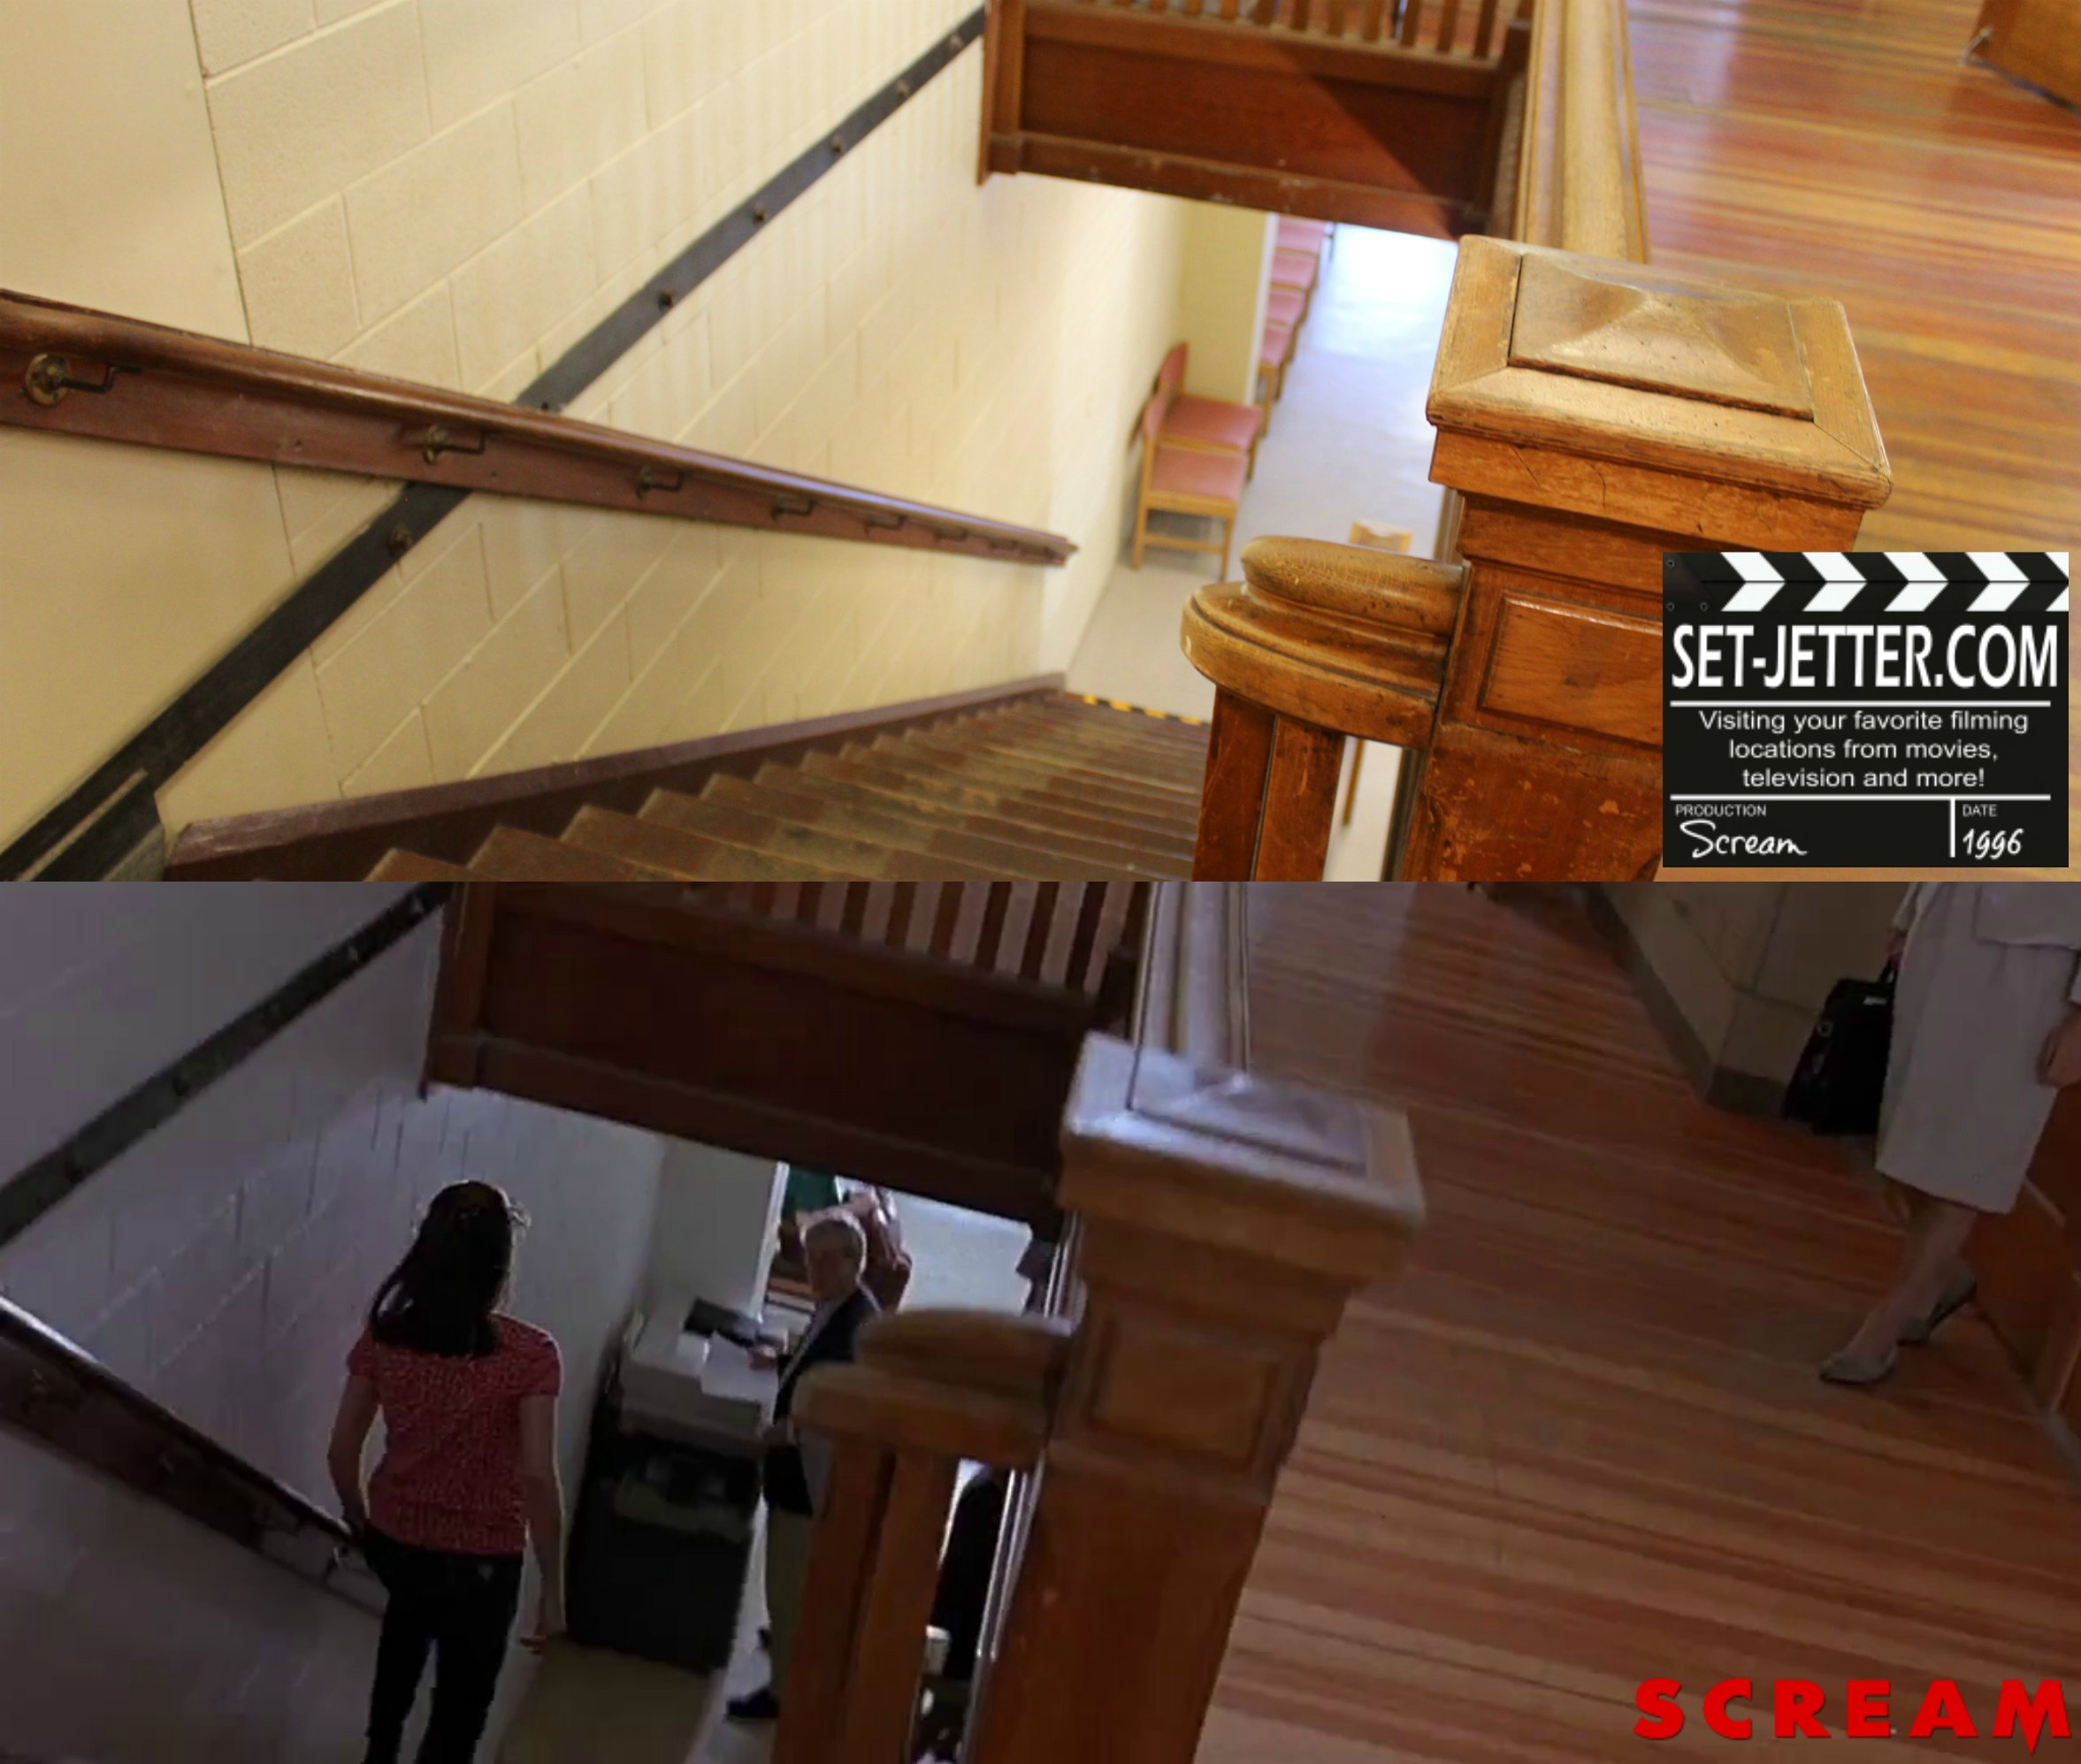 Scream comparison 115.jpg